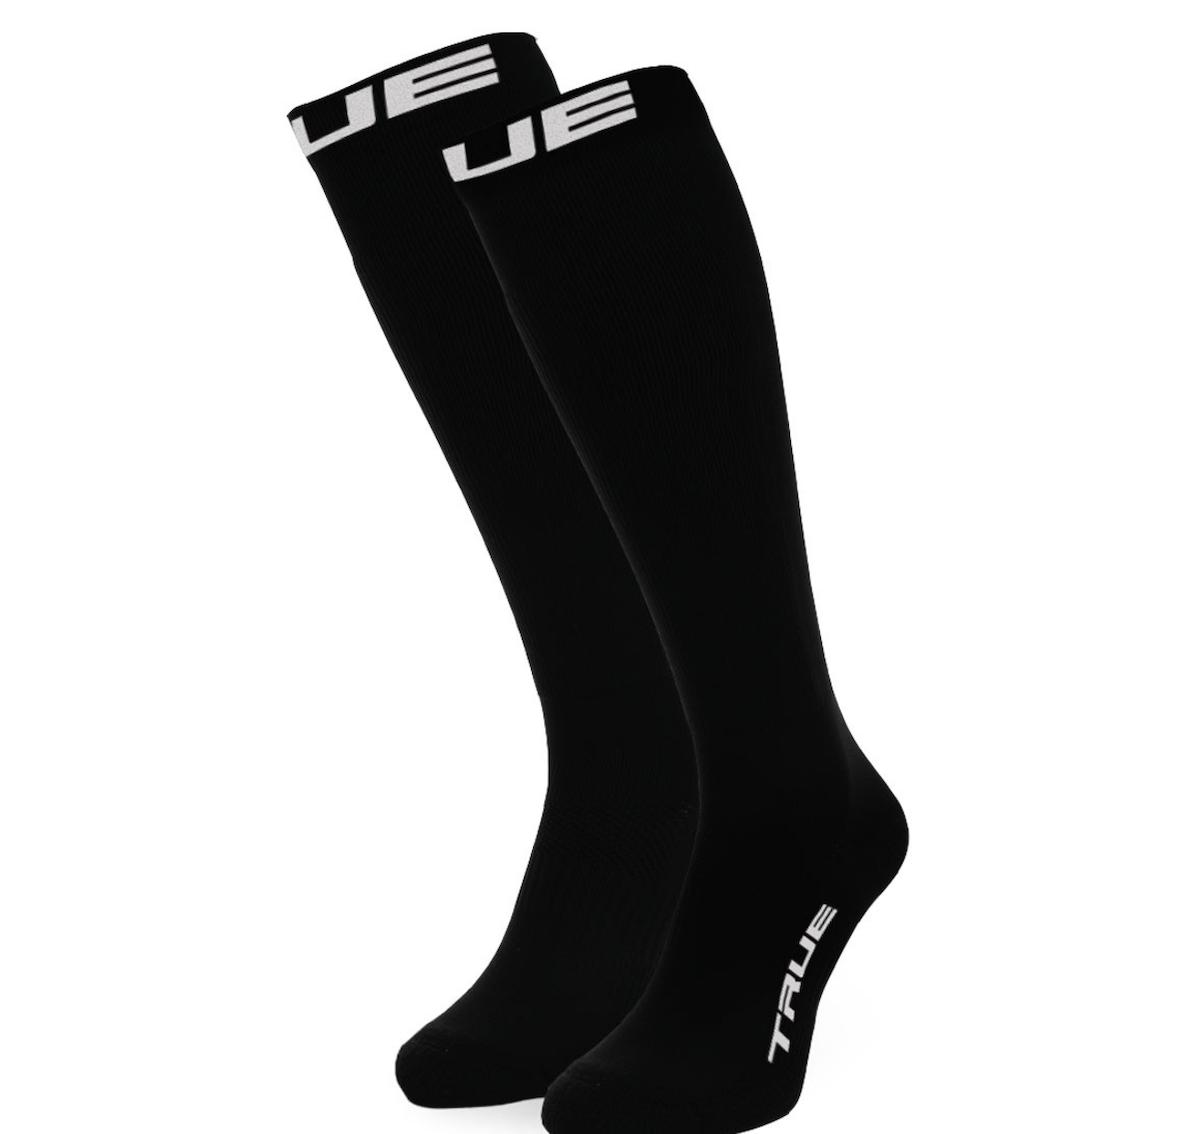 True Hockey Cut Resistant Sock